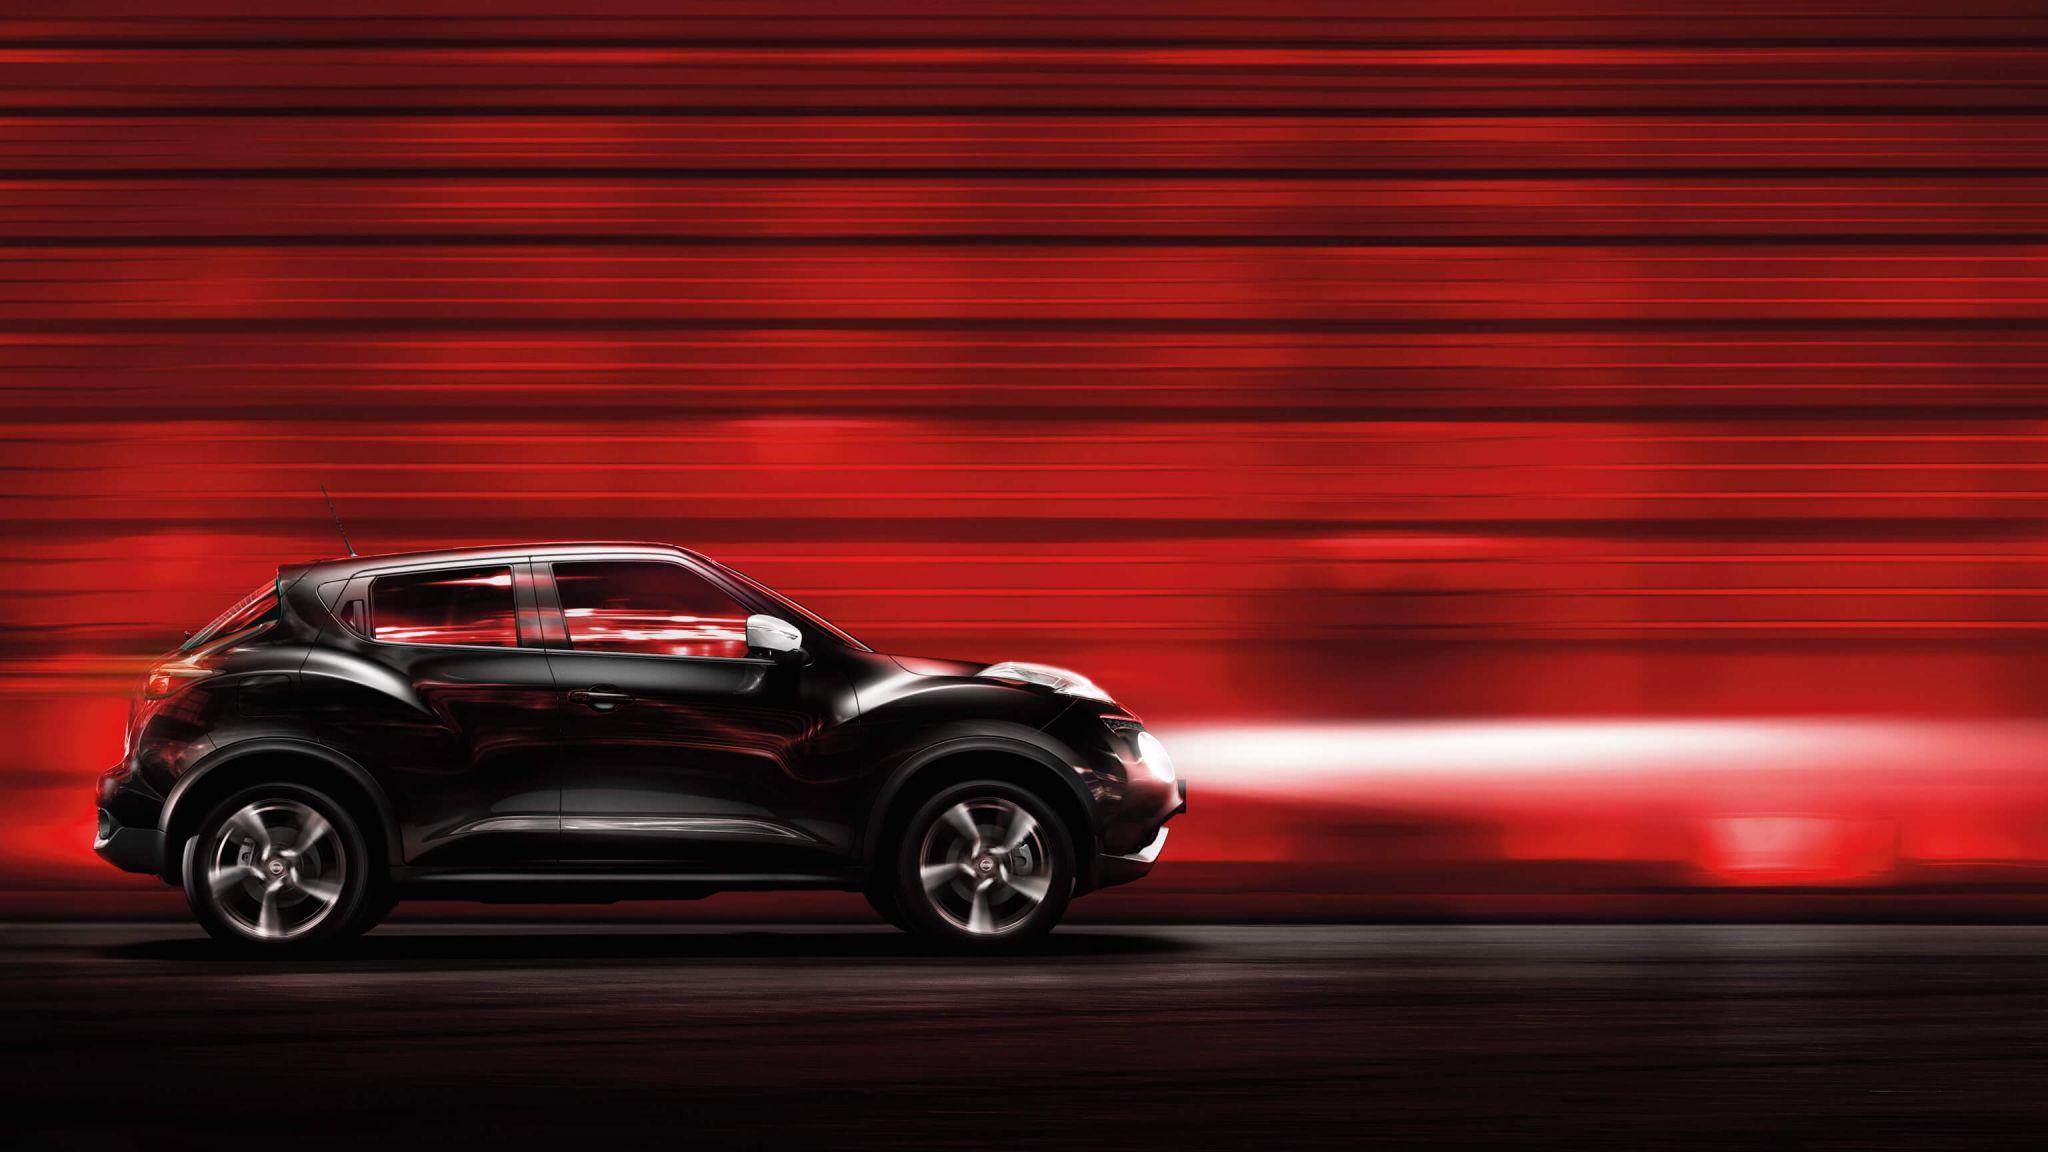 Lease Nissan Leaf >> Nissan Juke Proefrit - Bochane Groep